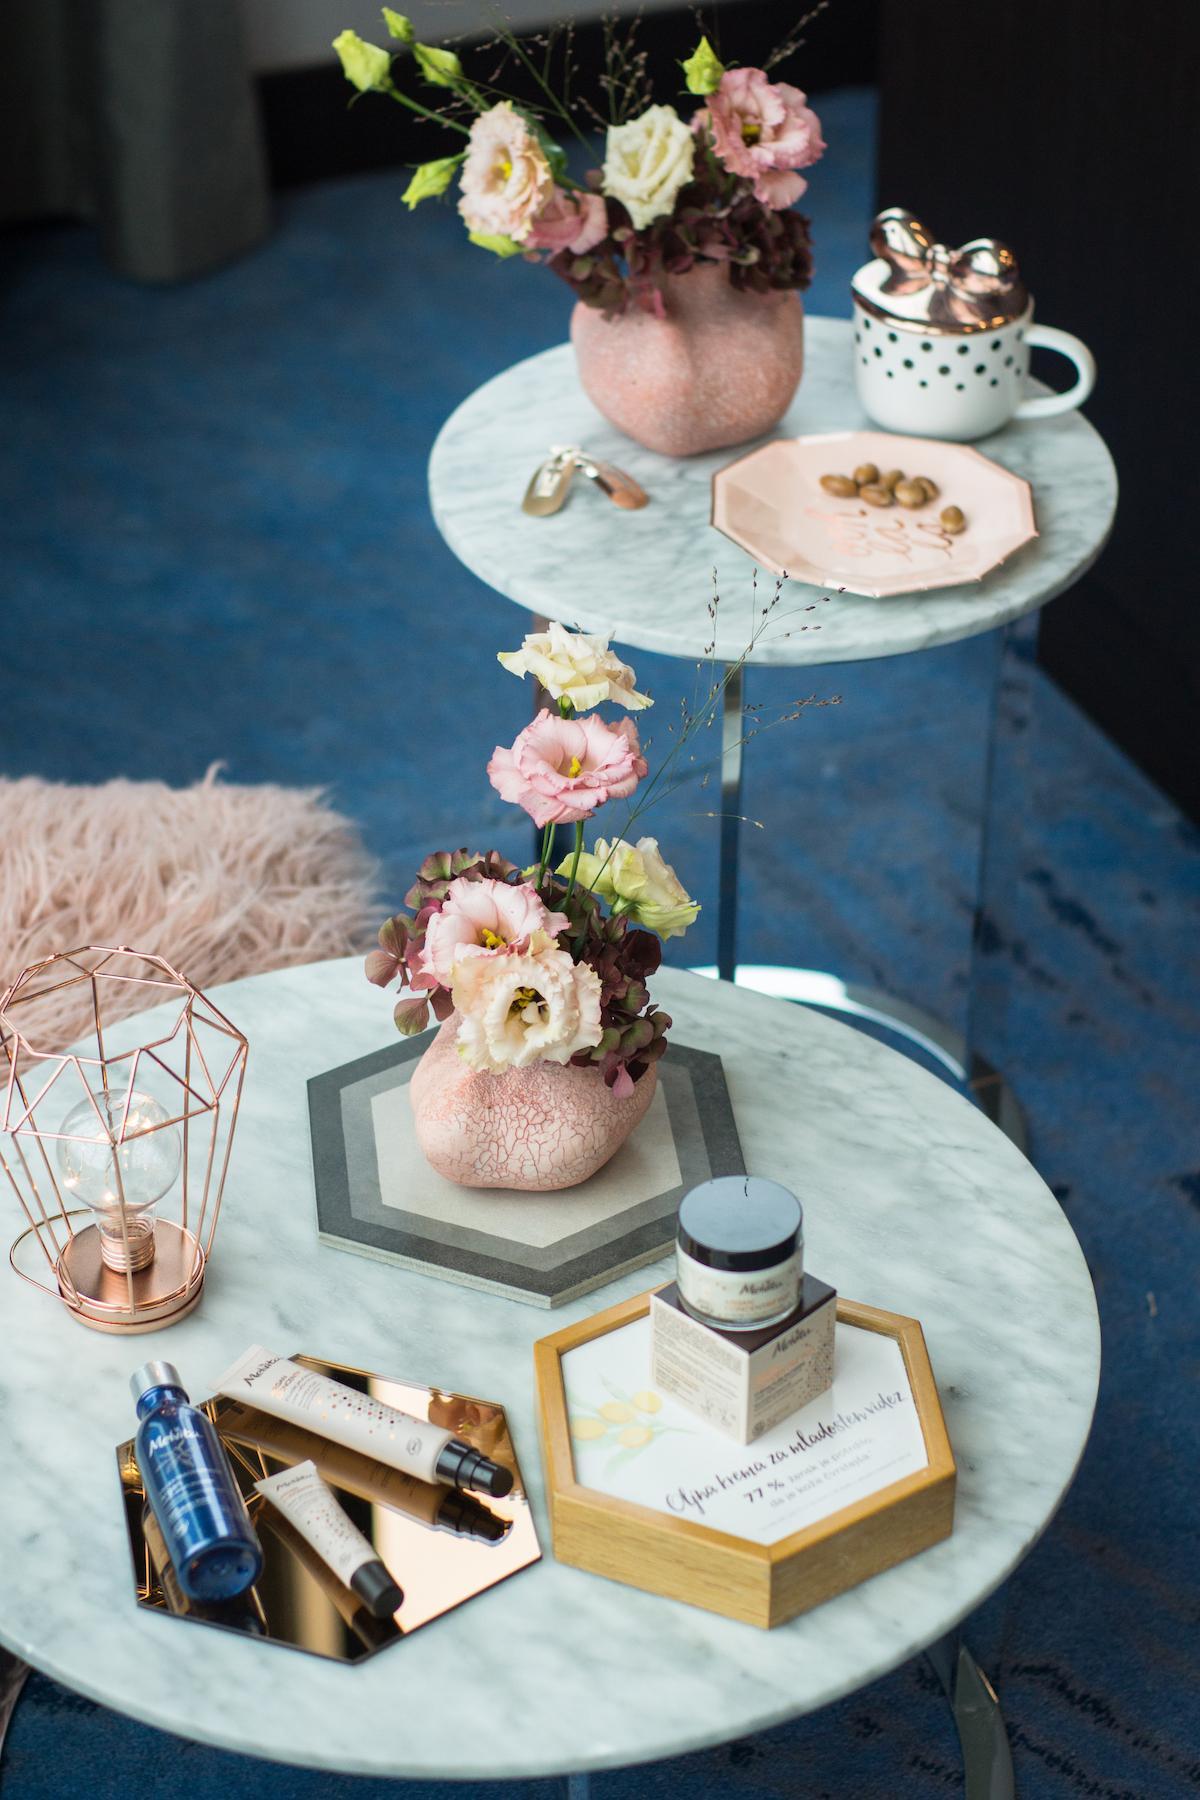 Melvita Argan Concentré Pur Beautyfull Blog